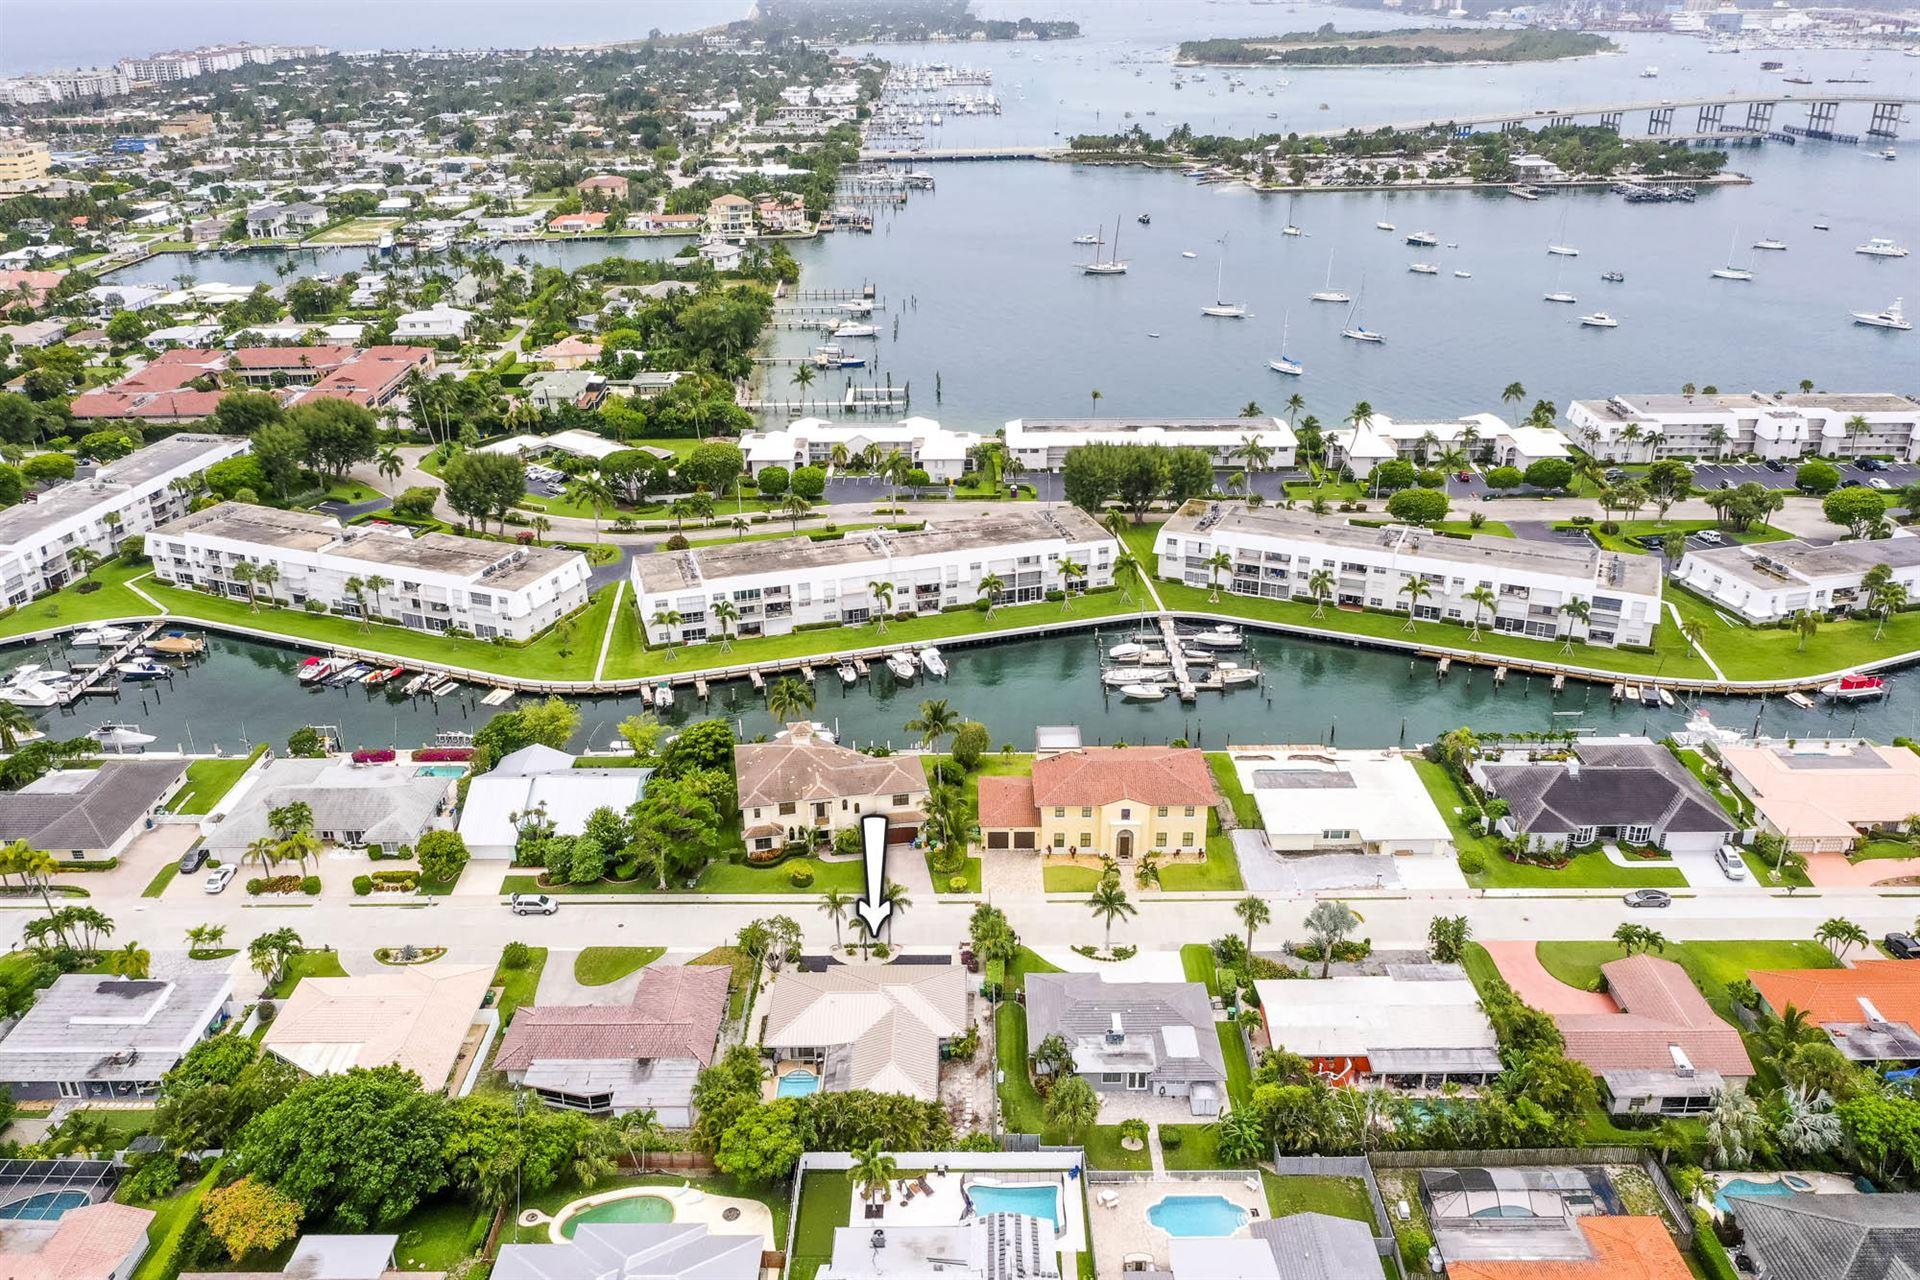 Photo of 1120 Singer Drive, Singer Island, FL 33404 (MLS # RX-10723890)